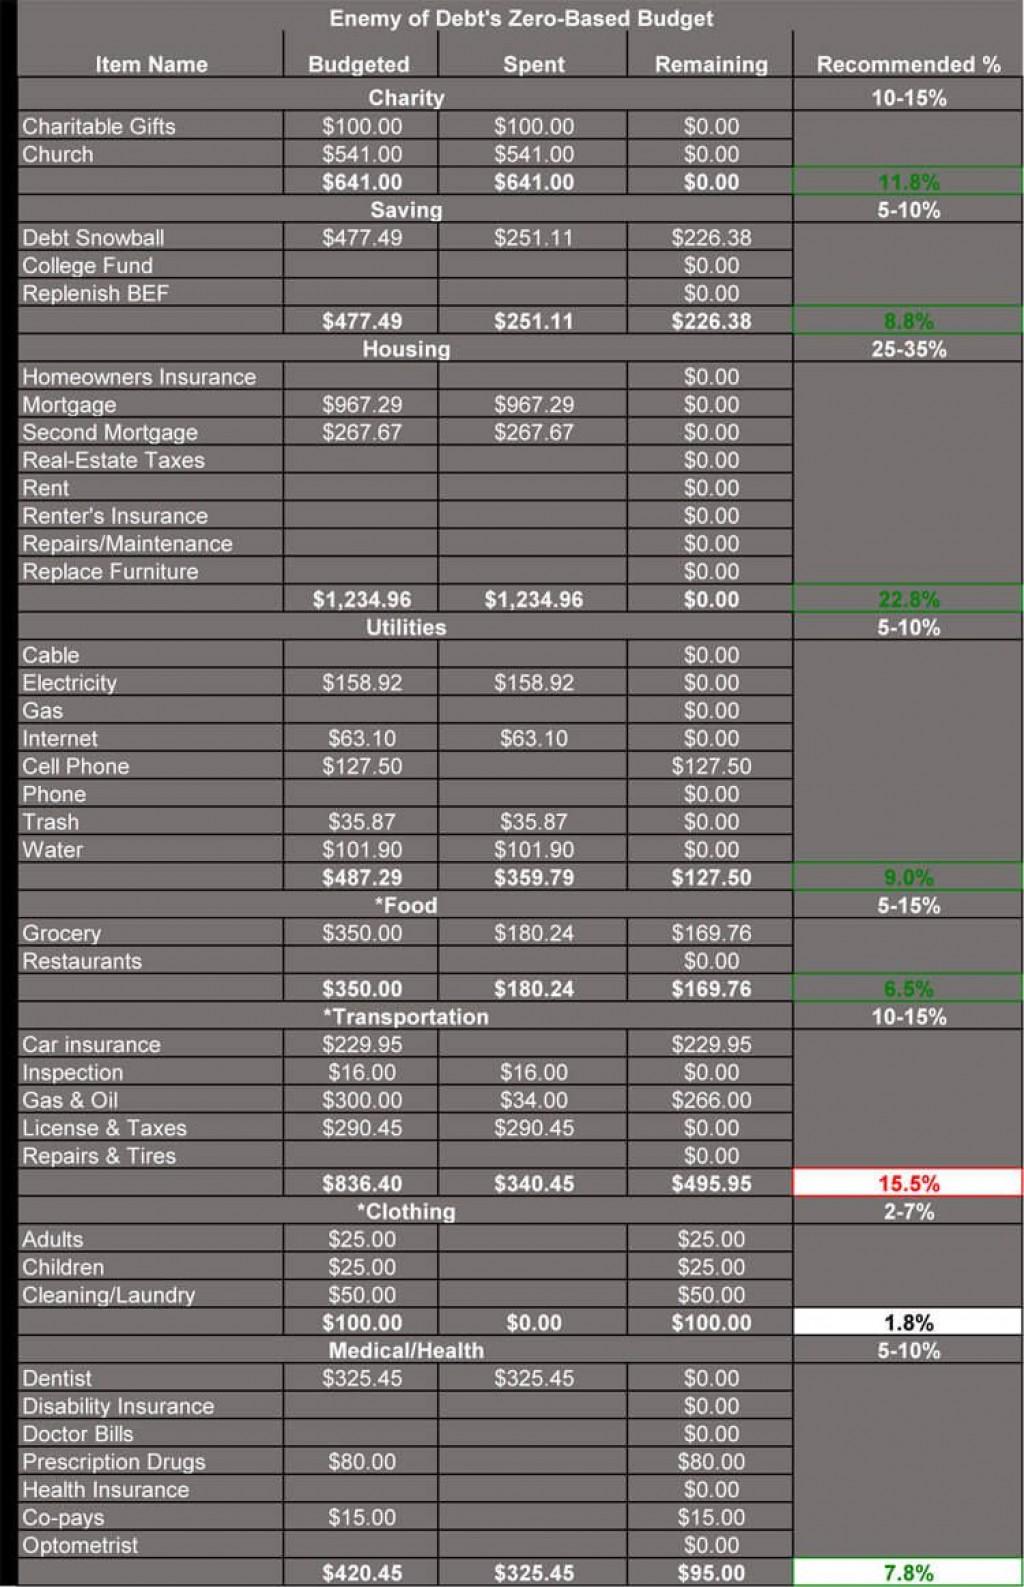 007 Unique Best Home Renovation Budget Template Excel Free Image Large